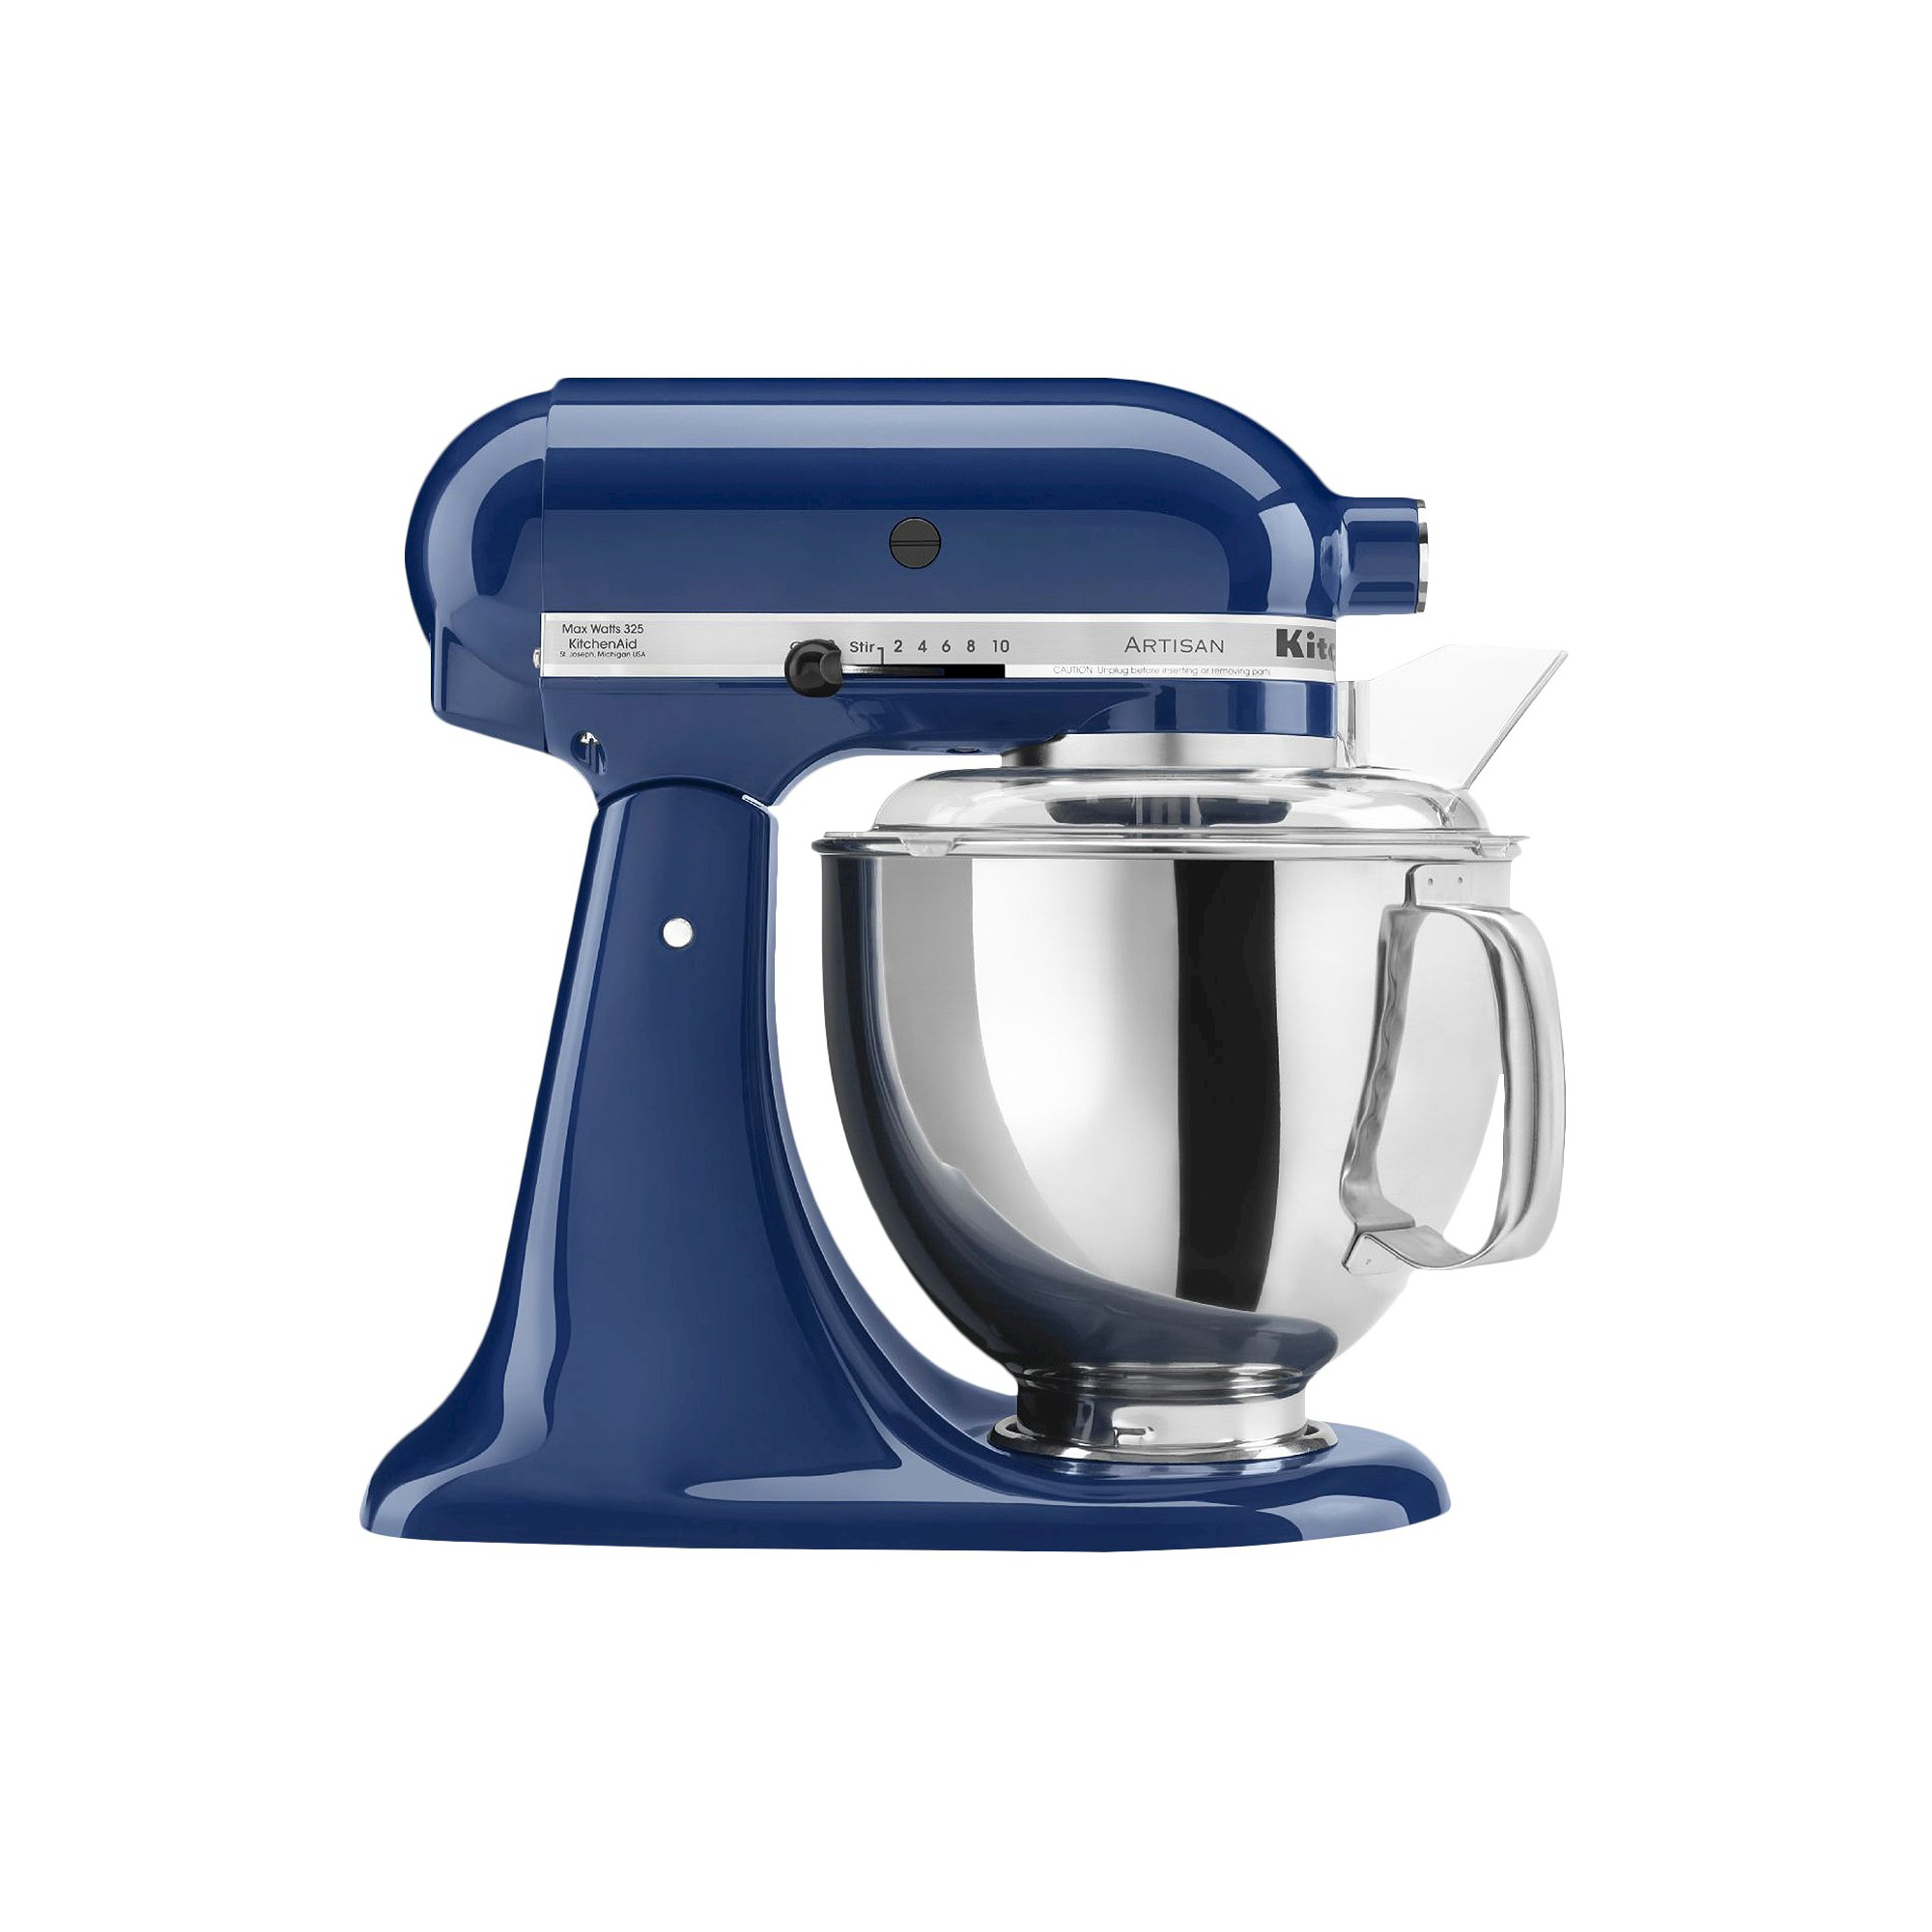 KitchenAid Artisan Series 5 Quart Tilt-Head Stand Mixer- Ksm150, Blue Willow